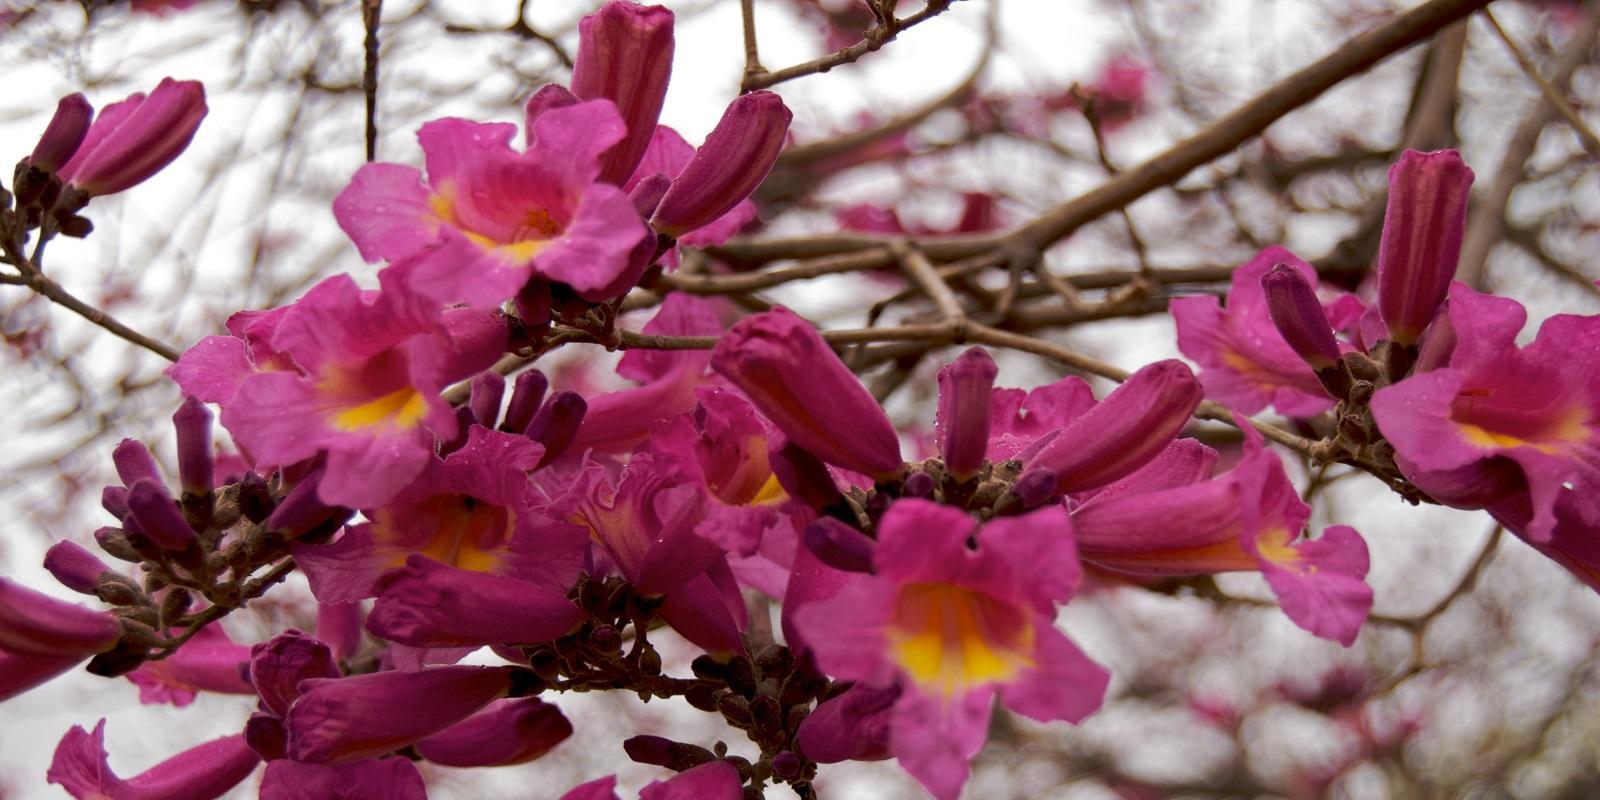 Lapacho, magická rostlina z pralesa zvyšující imunitu